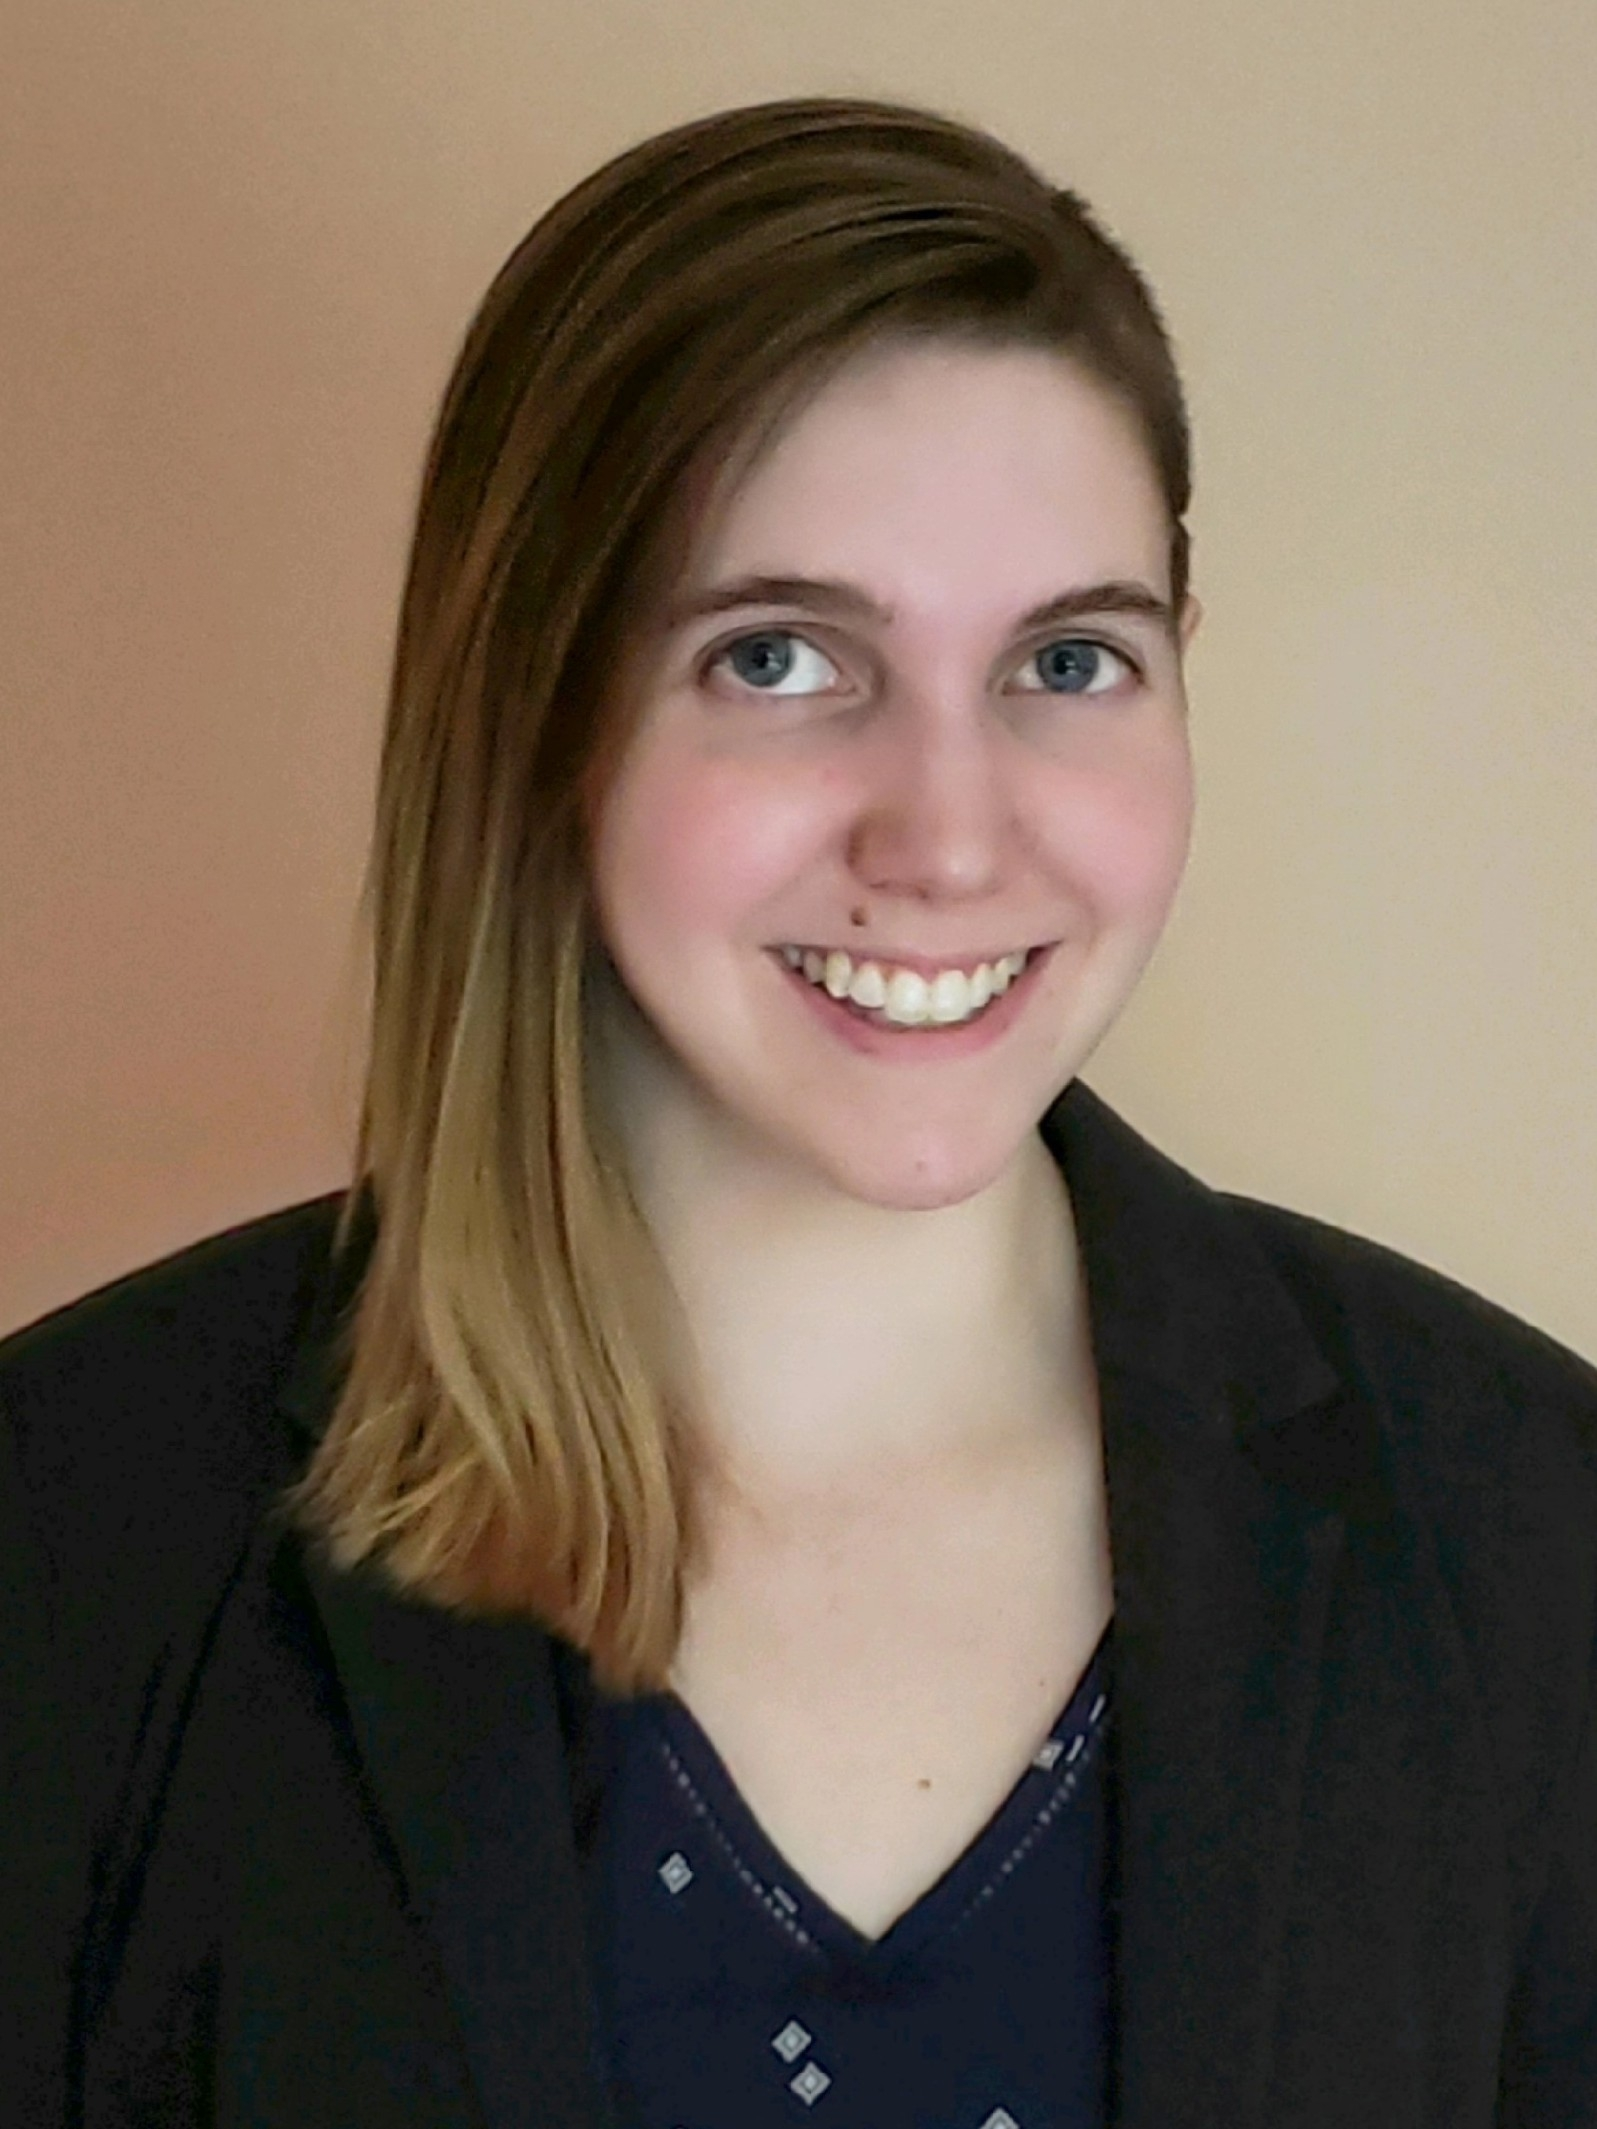 Sarah Jentilet